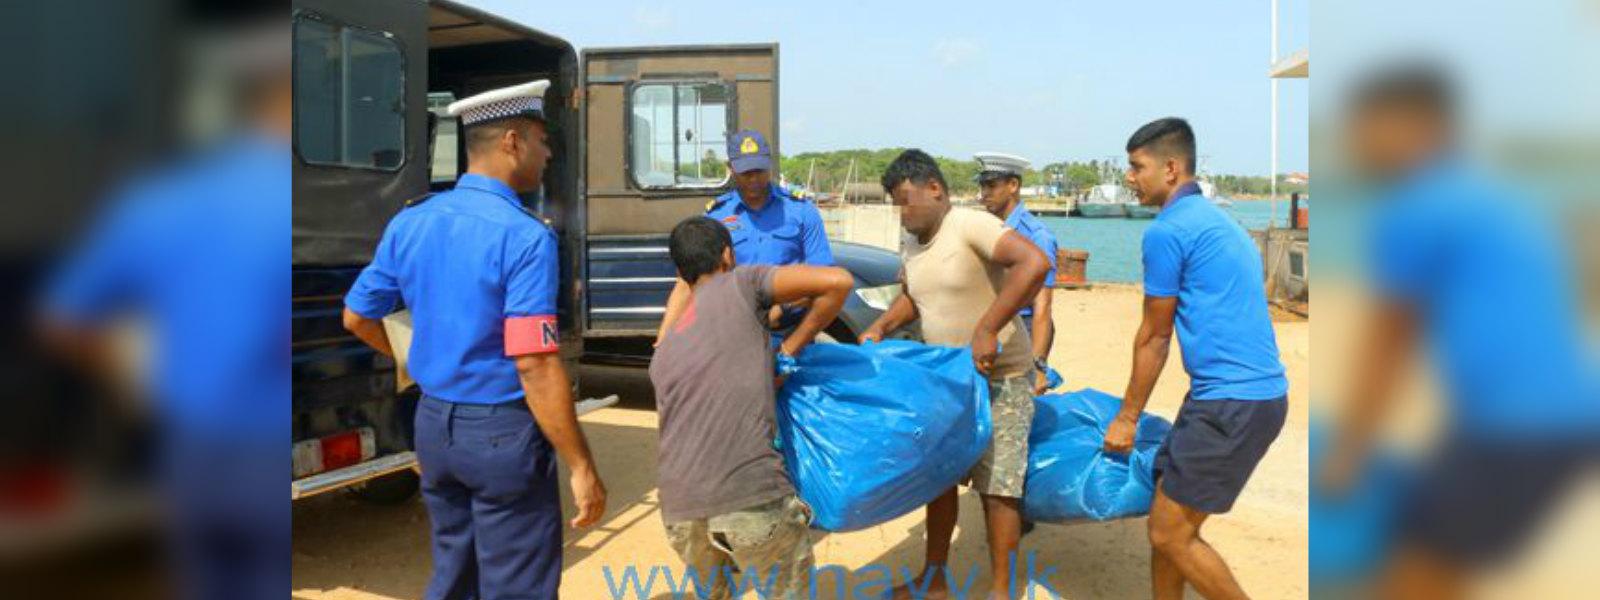 79kg of Kerala ganja seized by Navy